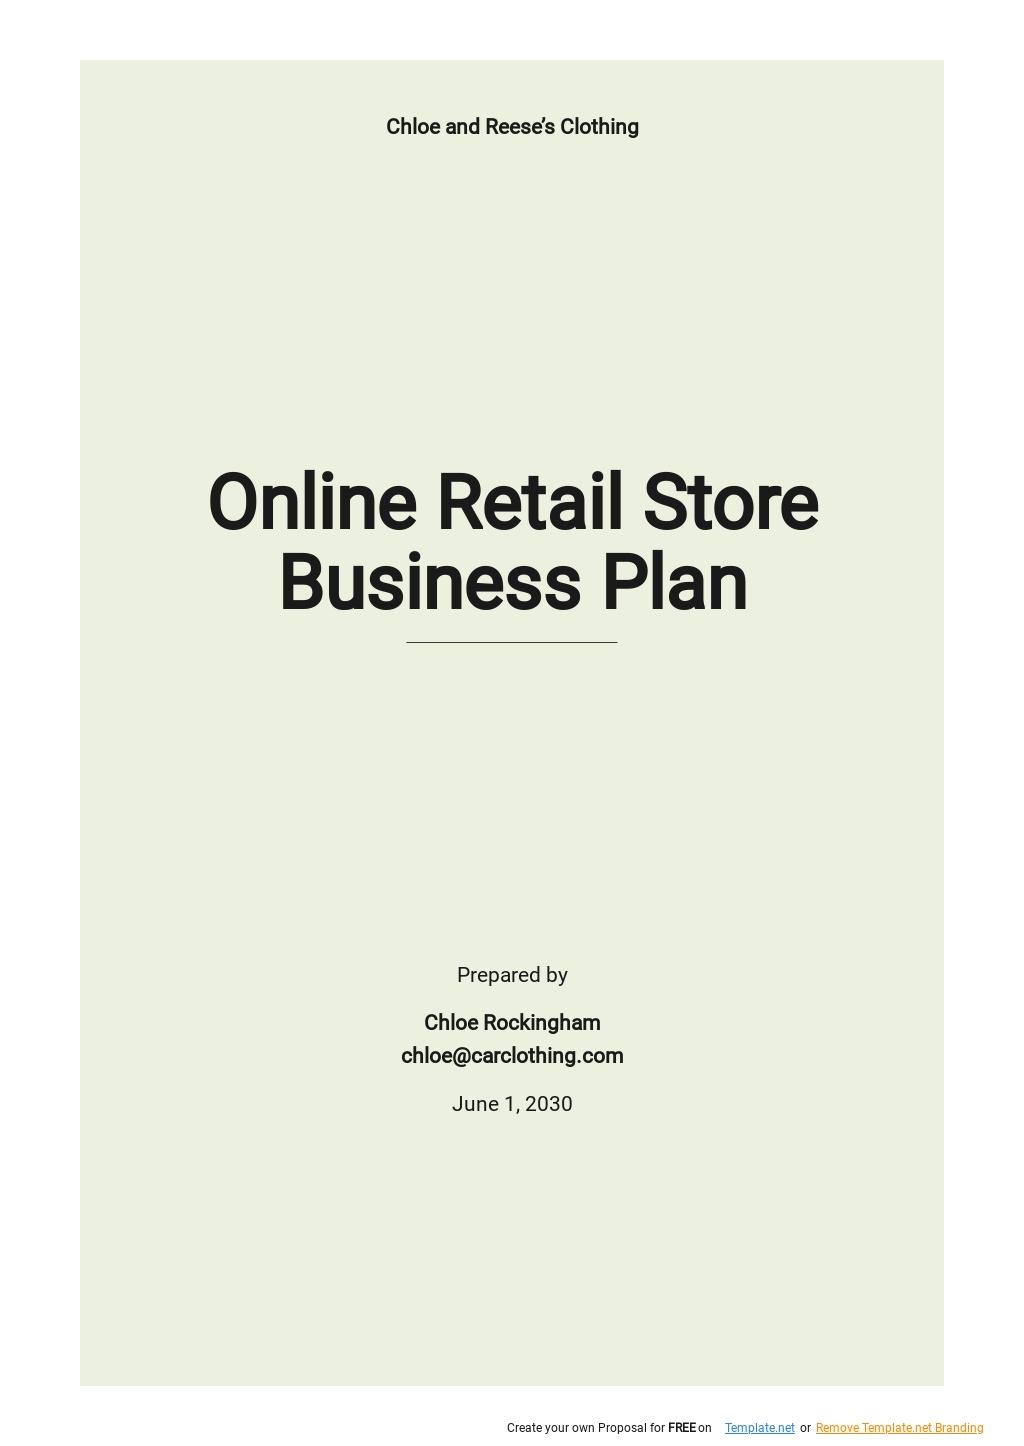 Online Retail Store Business Plan Template.jpe